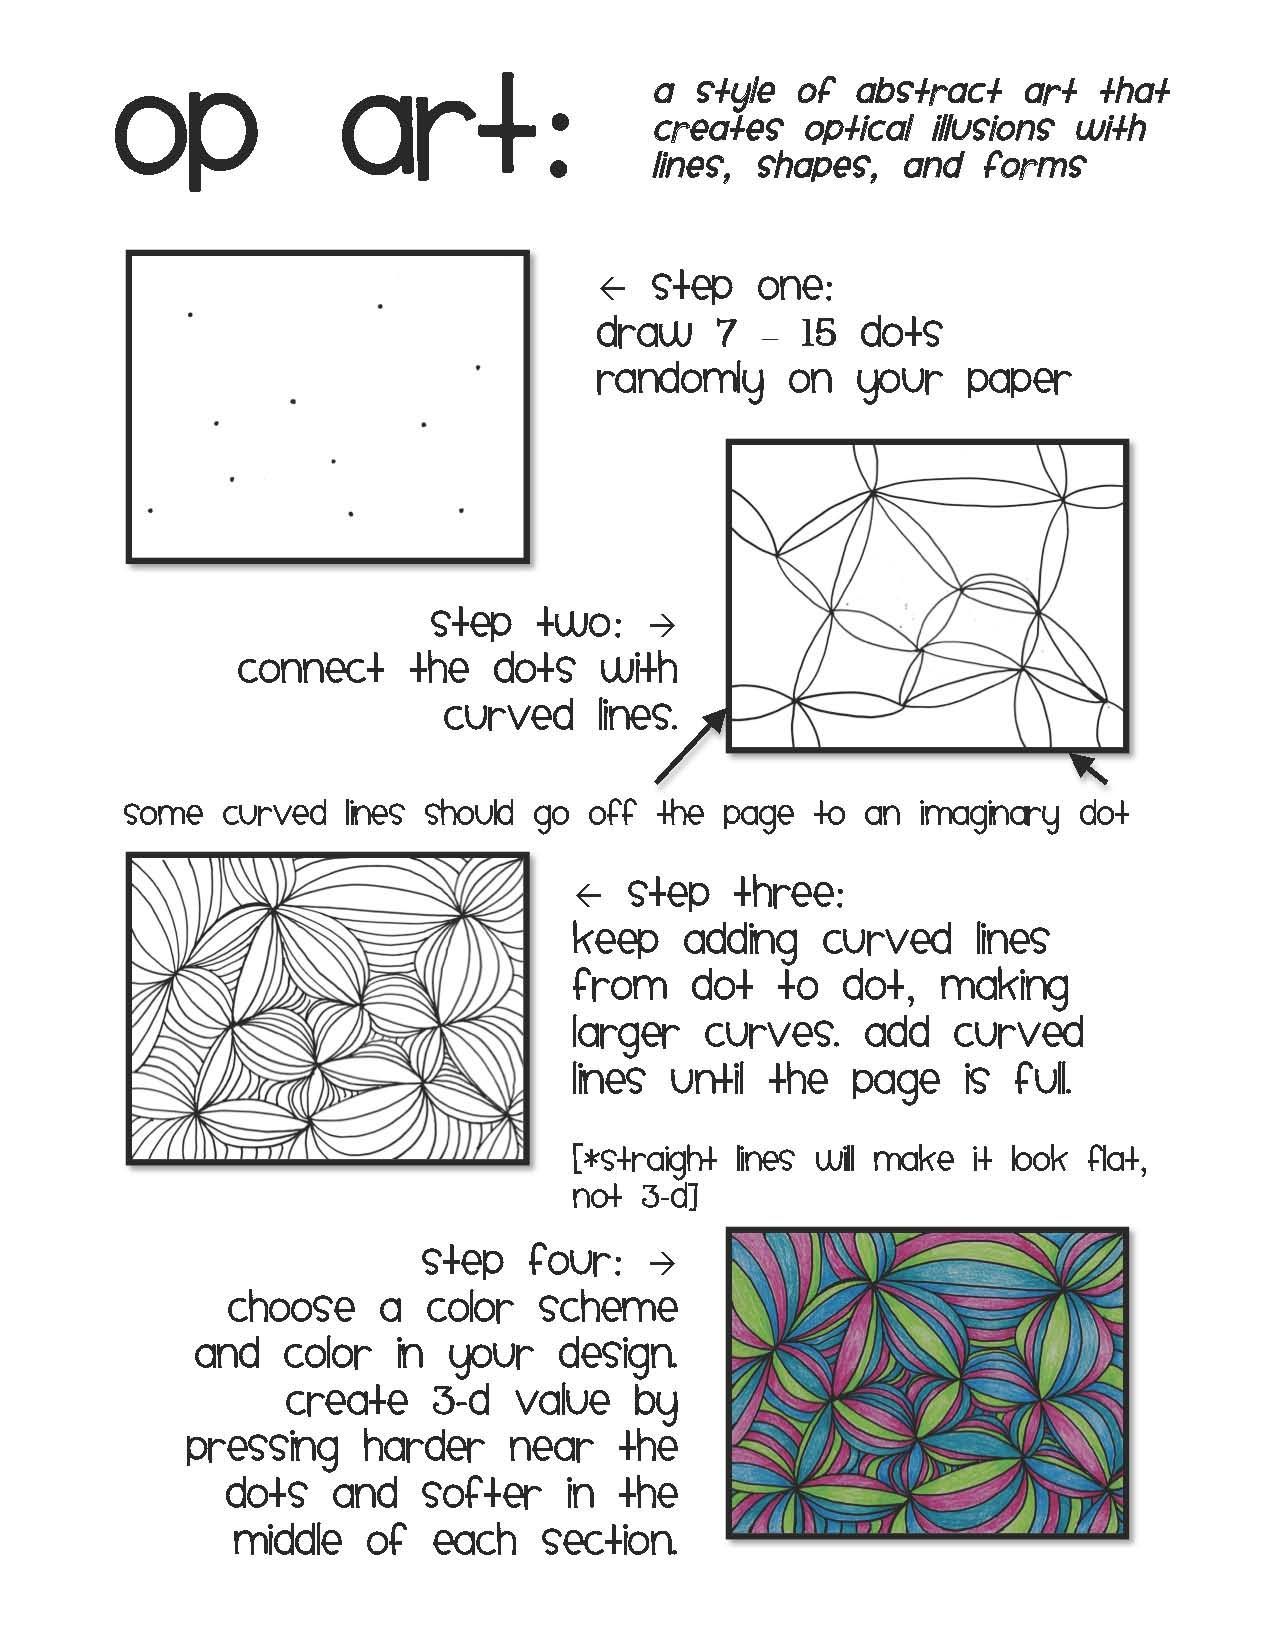 Worksheets Optical Illusion Worksheets httpmedia cache ak0 pinimg comoriginals308026 zentangles